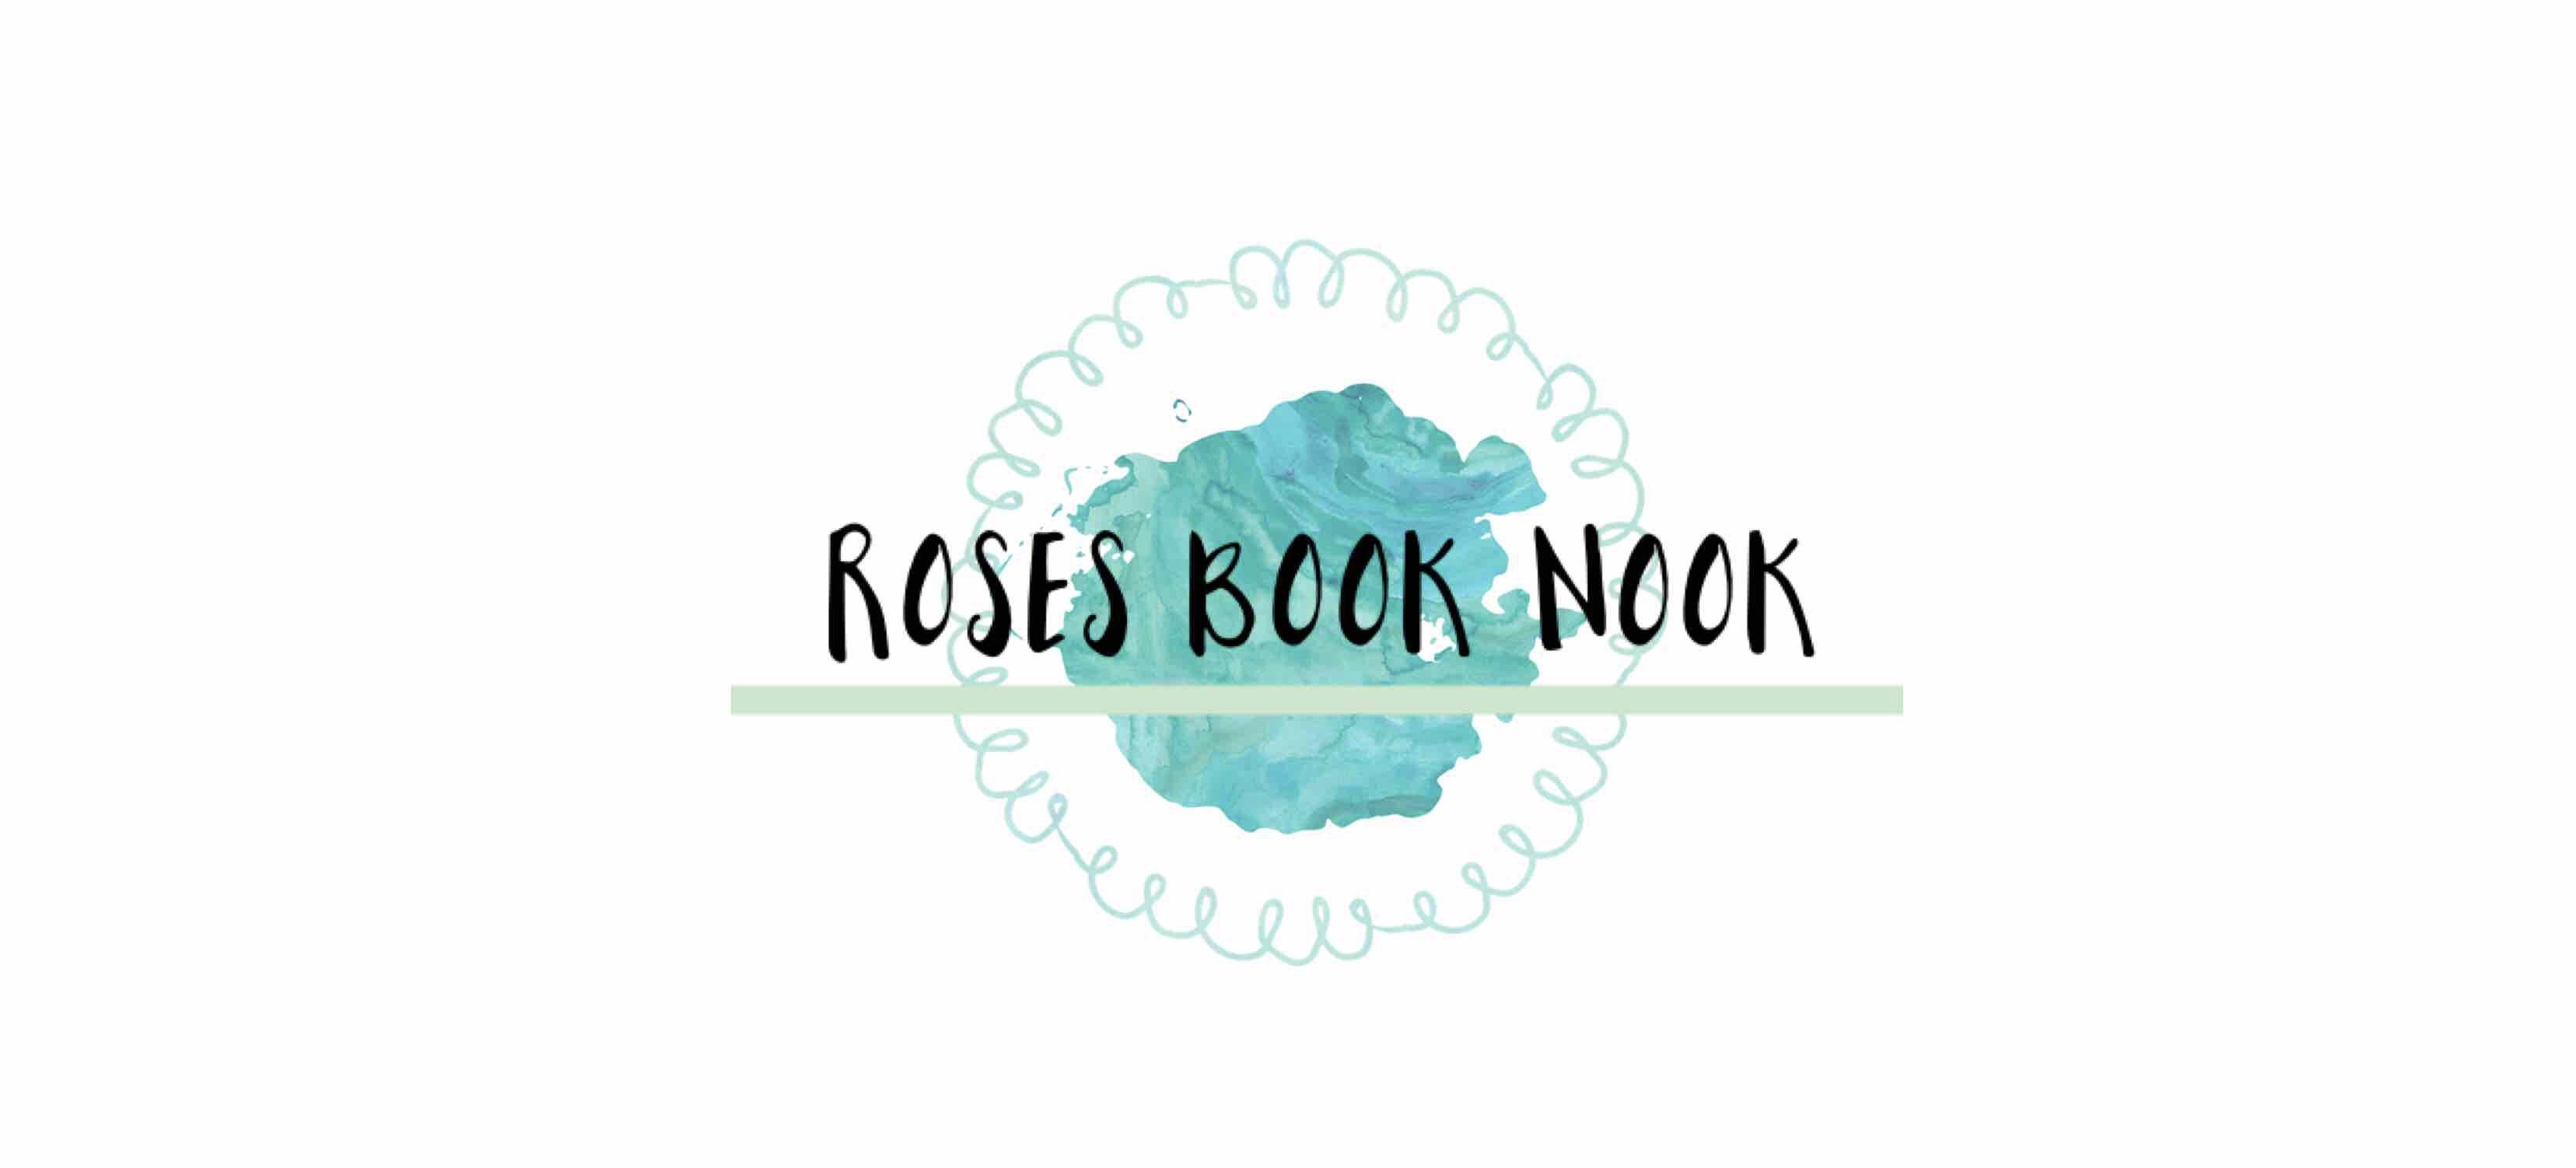 Roses Book Nook